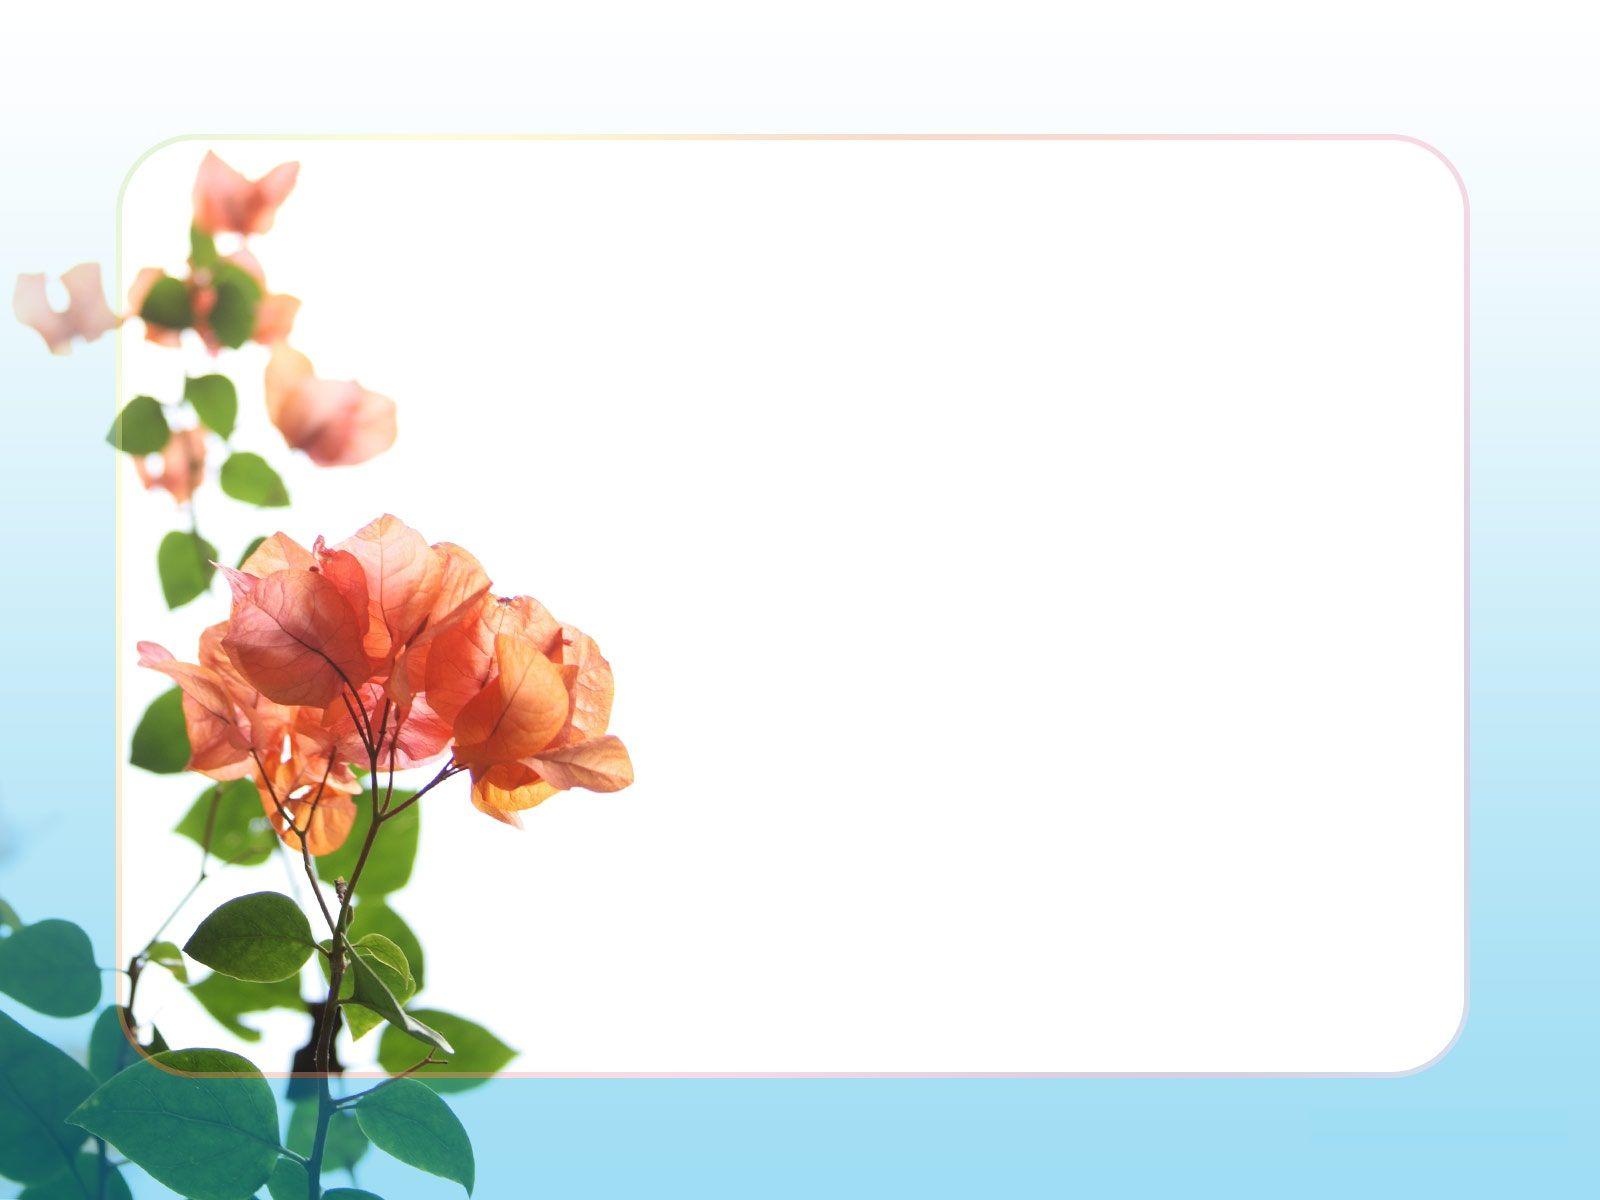 Flower Border Clip Art Hd Background Wallpaper 27 HD.